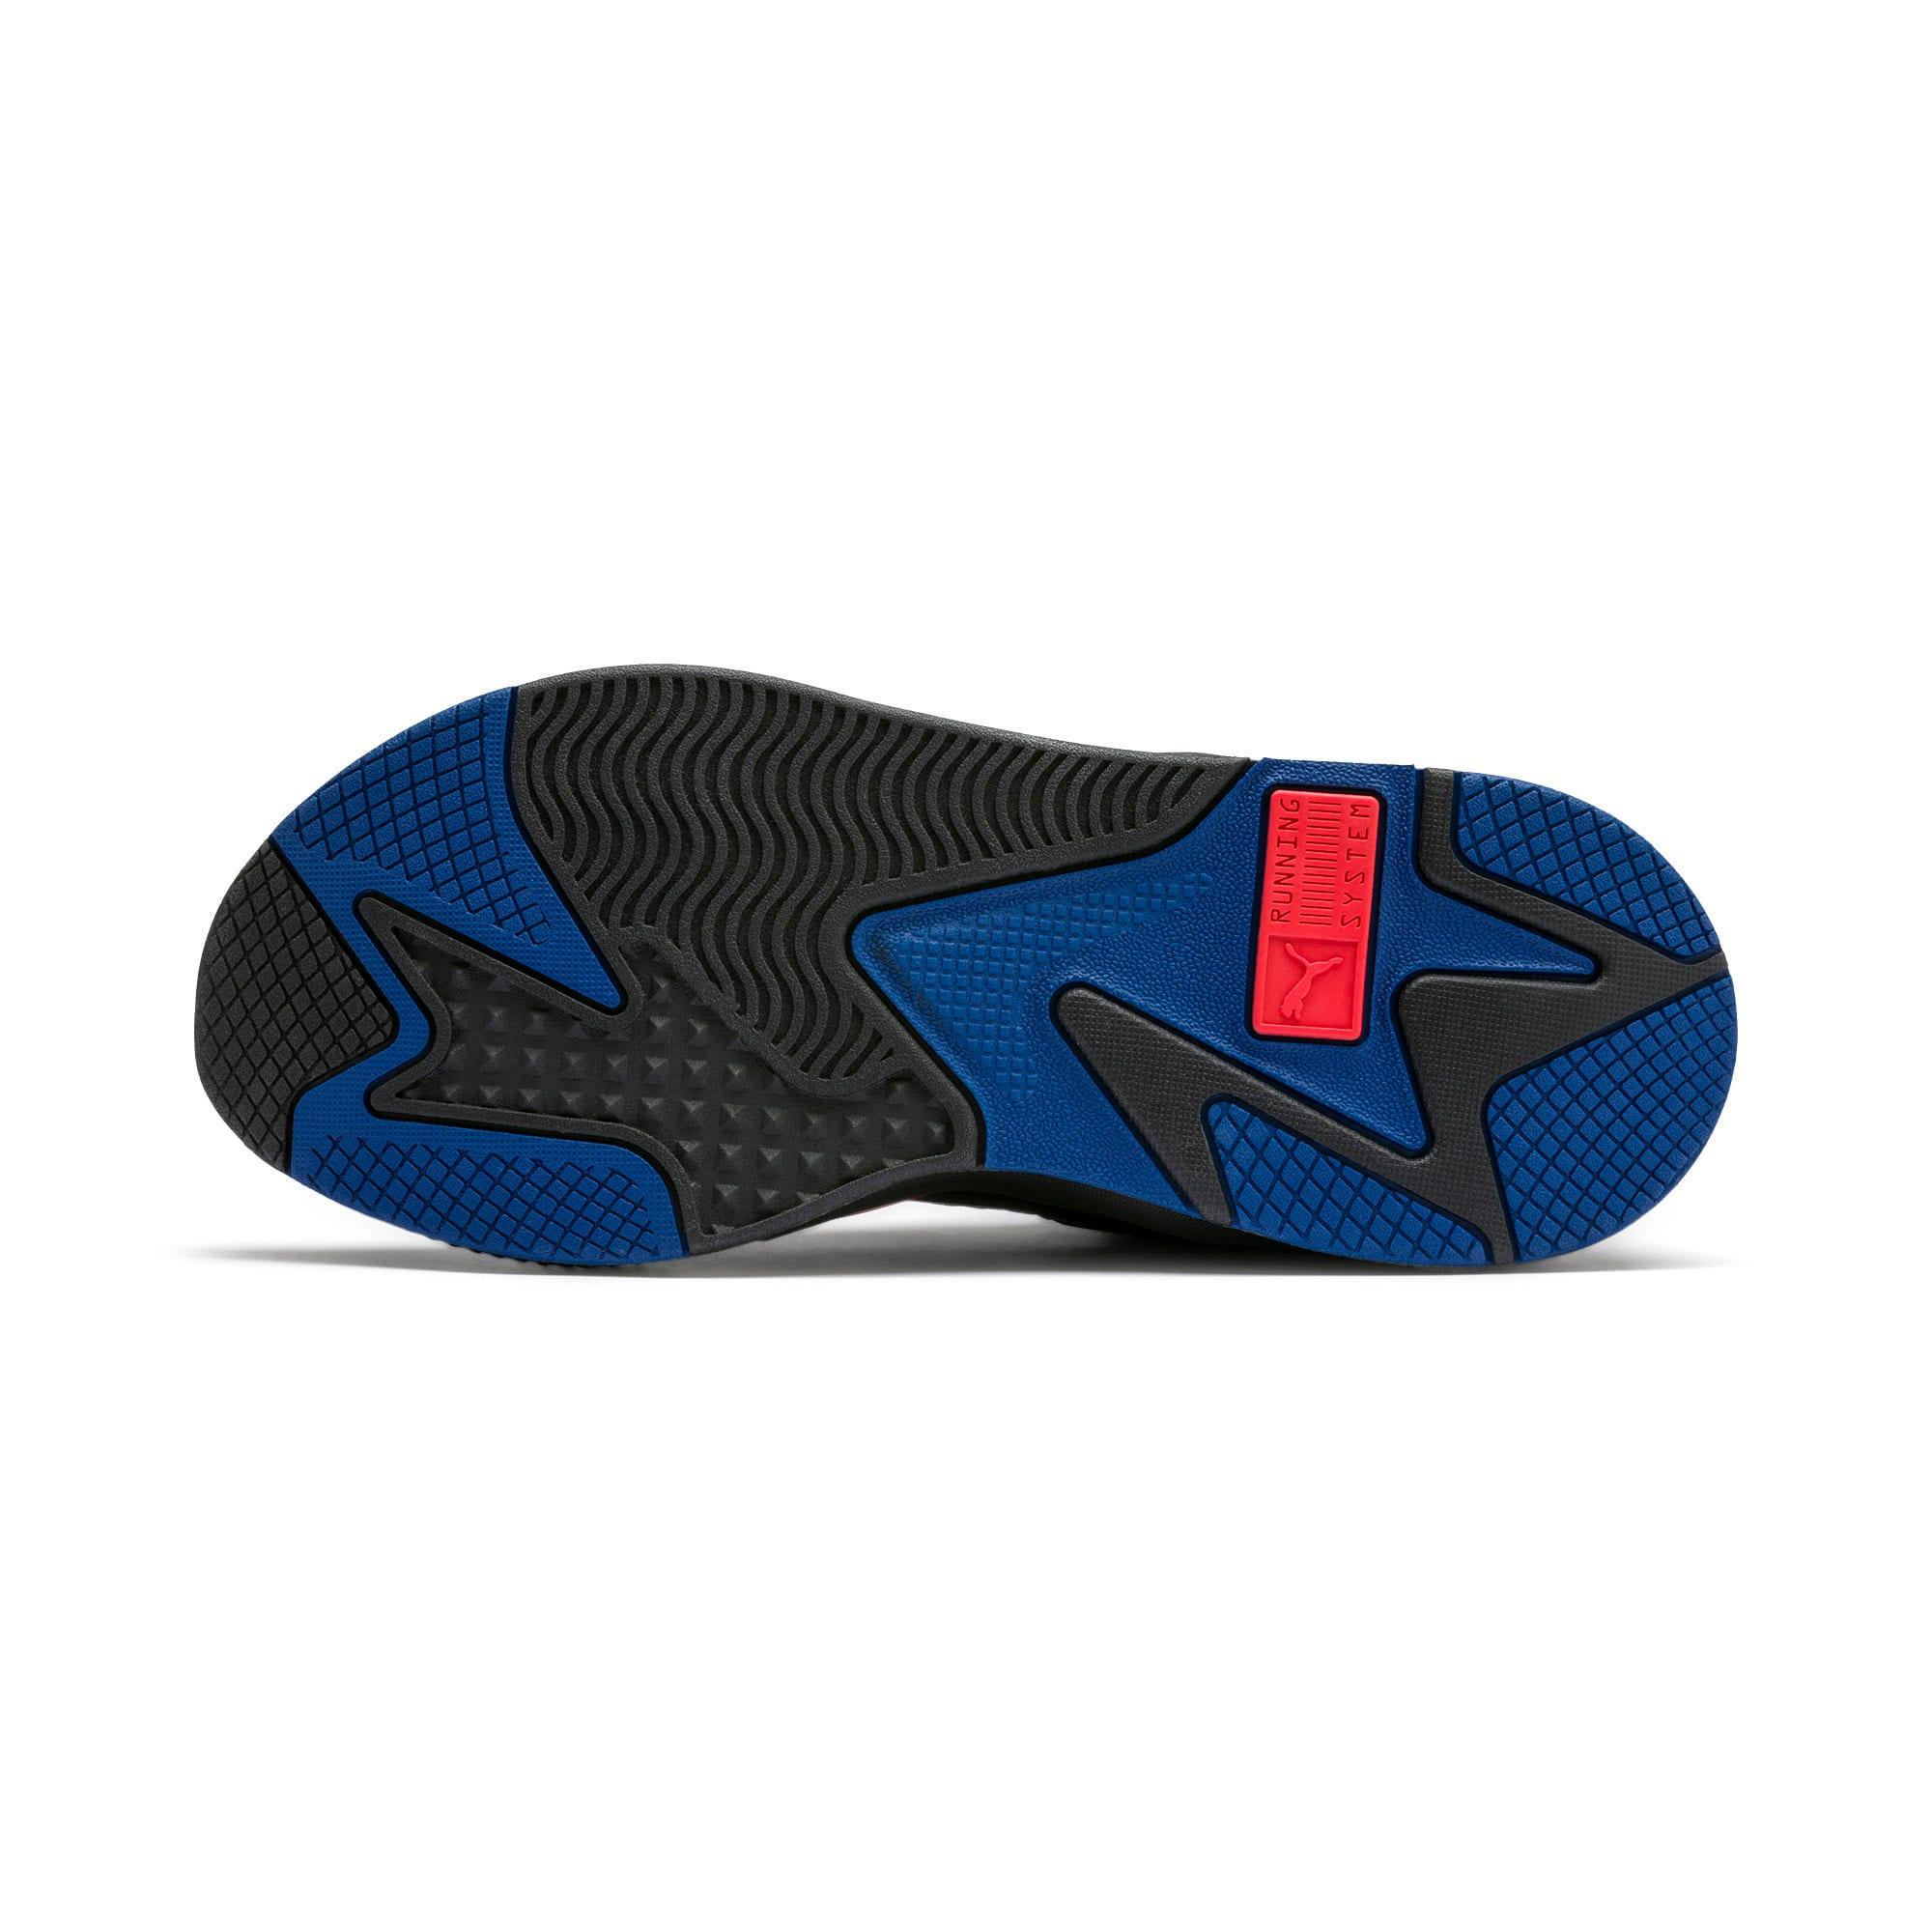 Thumbnail 5 of RS-X Softcase Sneaker, Puma Black-Galaxy Blue, medium